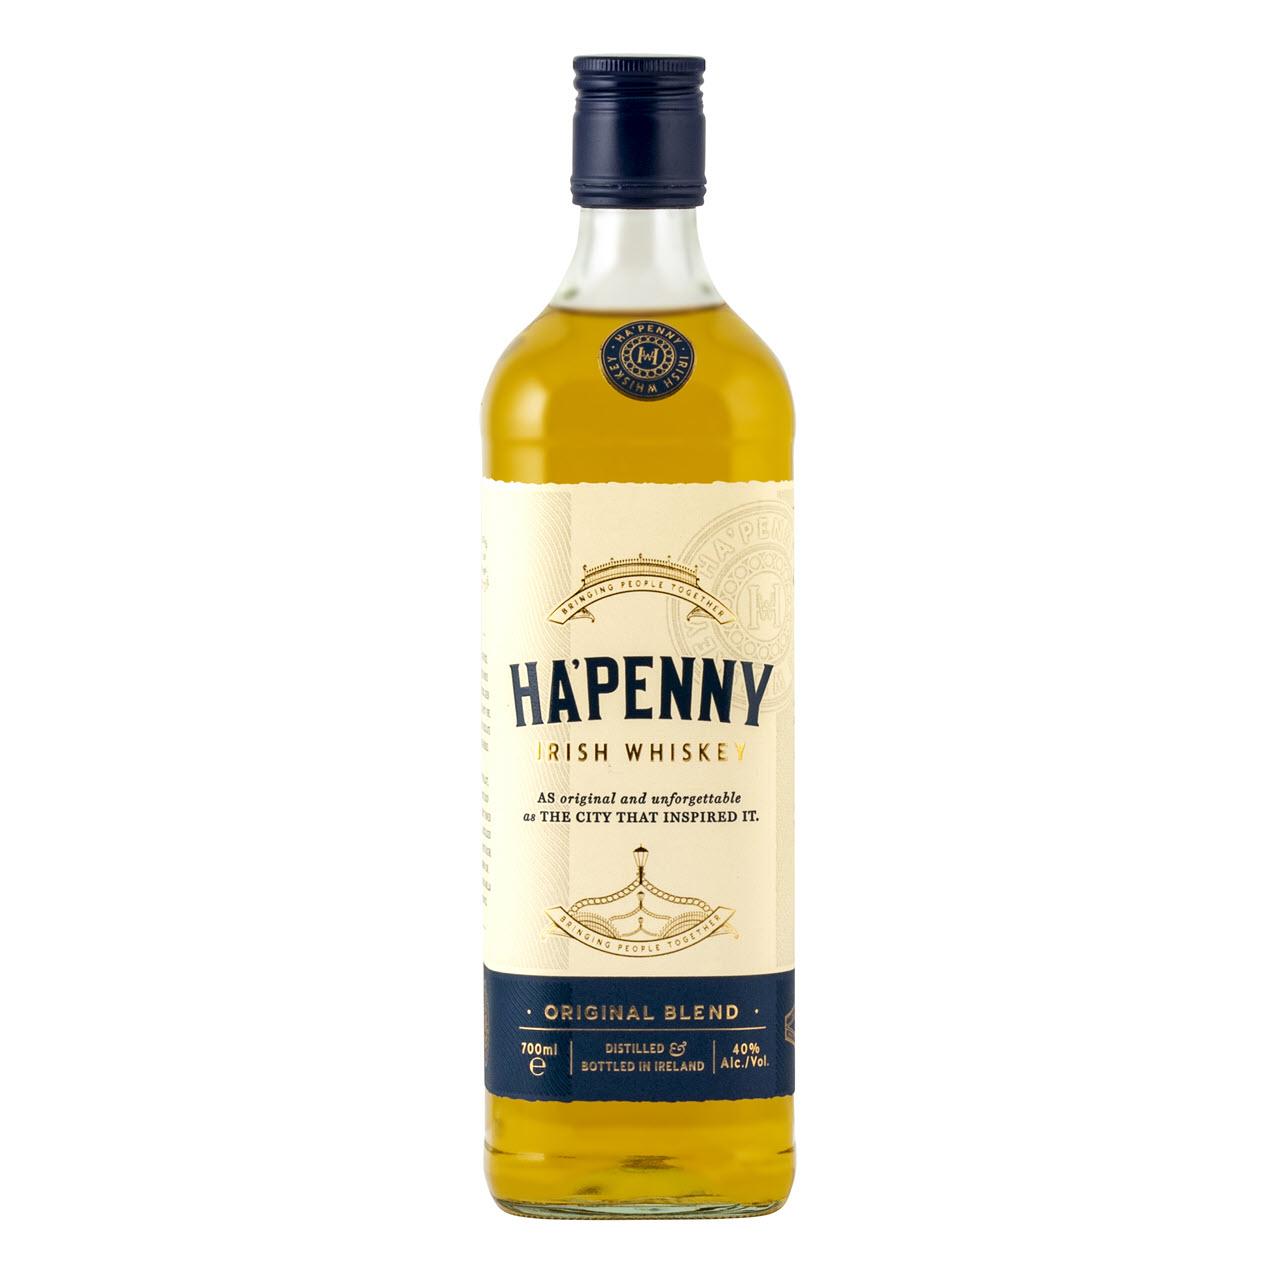 hapenny-irish-whiskey.jpg